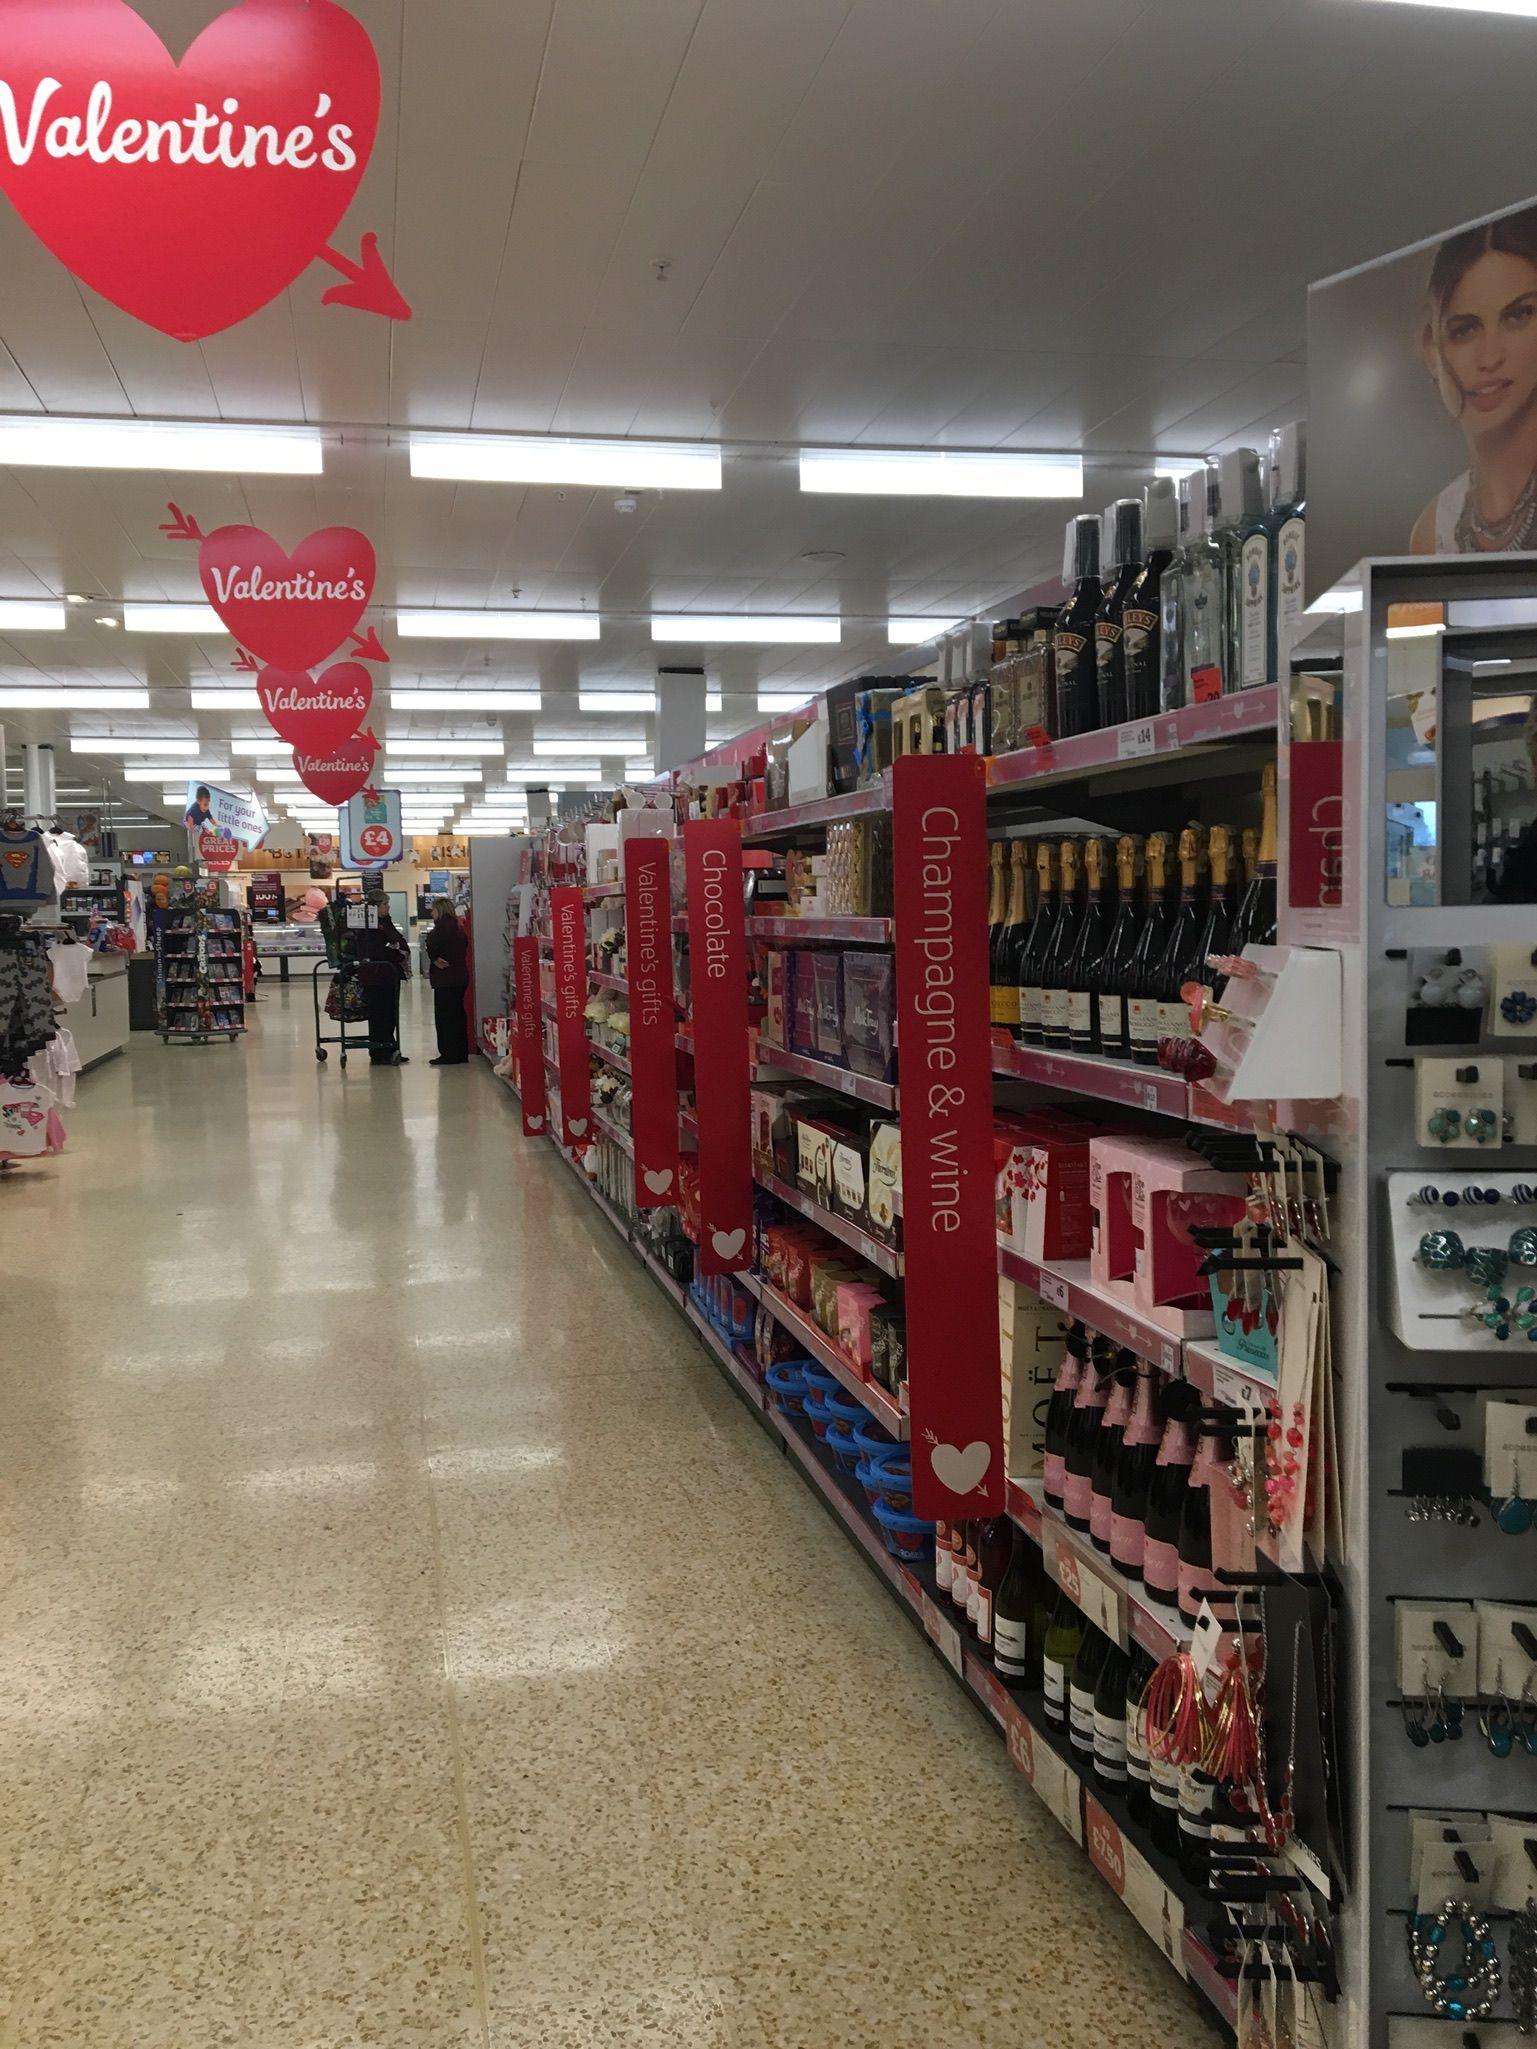 Sainsburys Valentines Shoppermarketing Retail Pos Pointofsale Shopping Design Storedesign Passionateabo Store Design Display Design Shopper Marketing